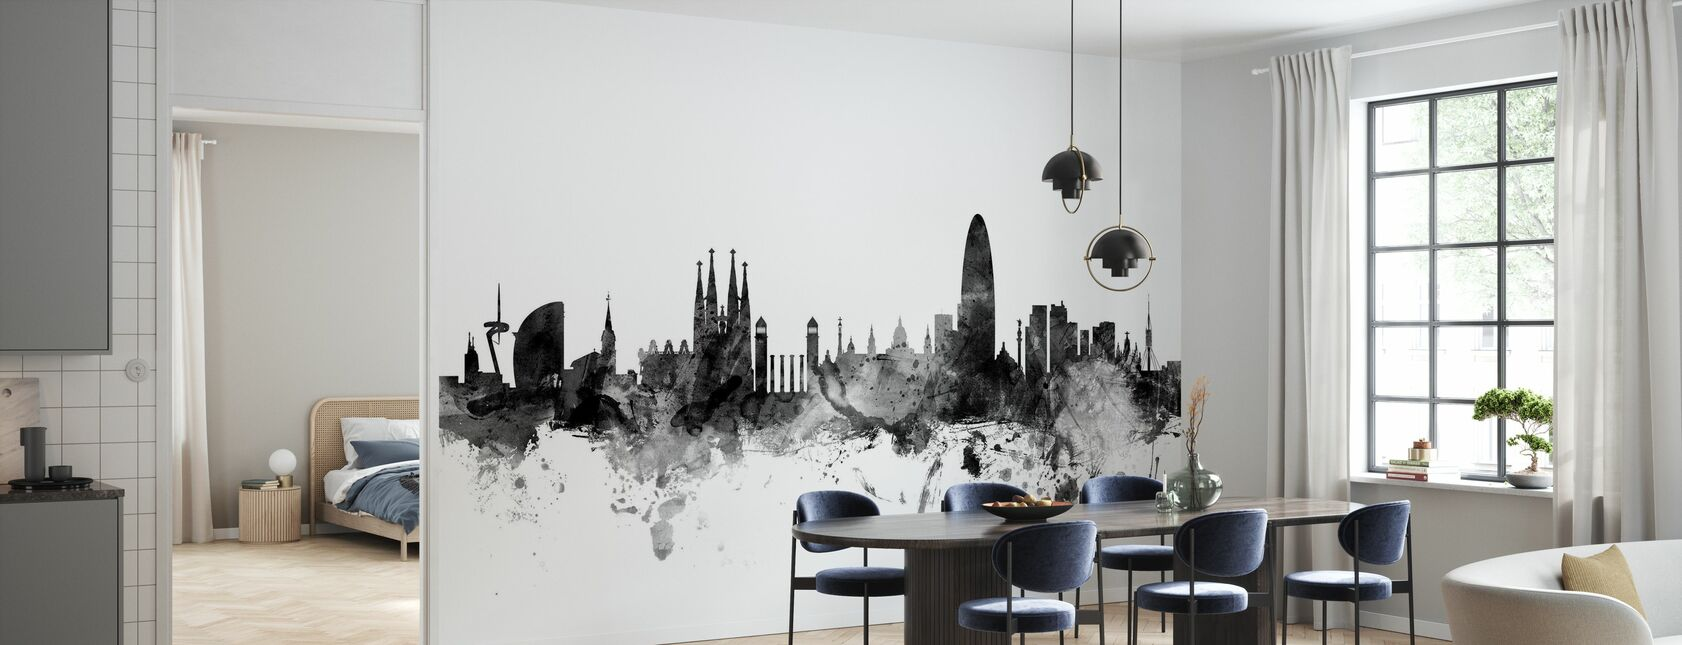 Barcelona Skyline Black - Wallpaper - Kitchen